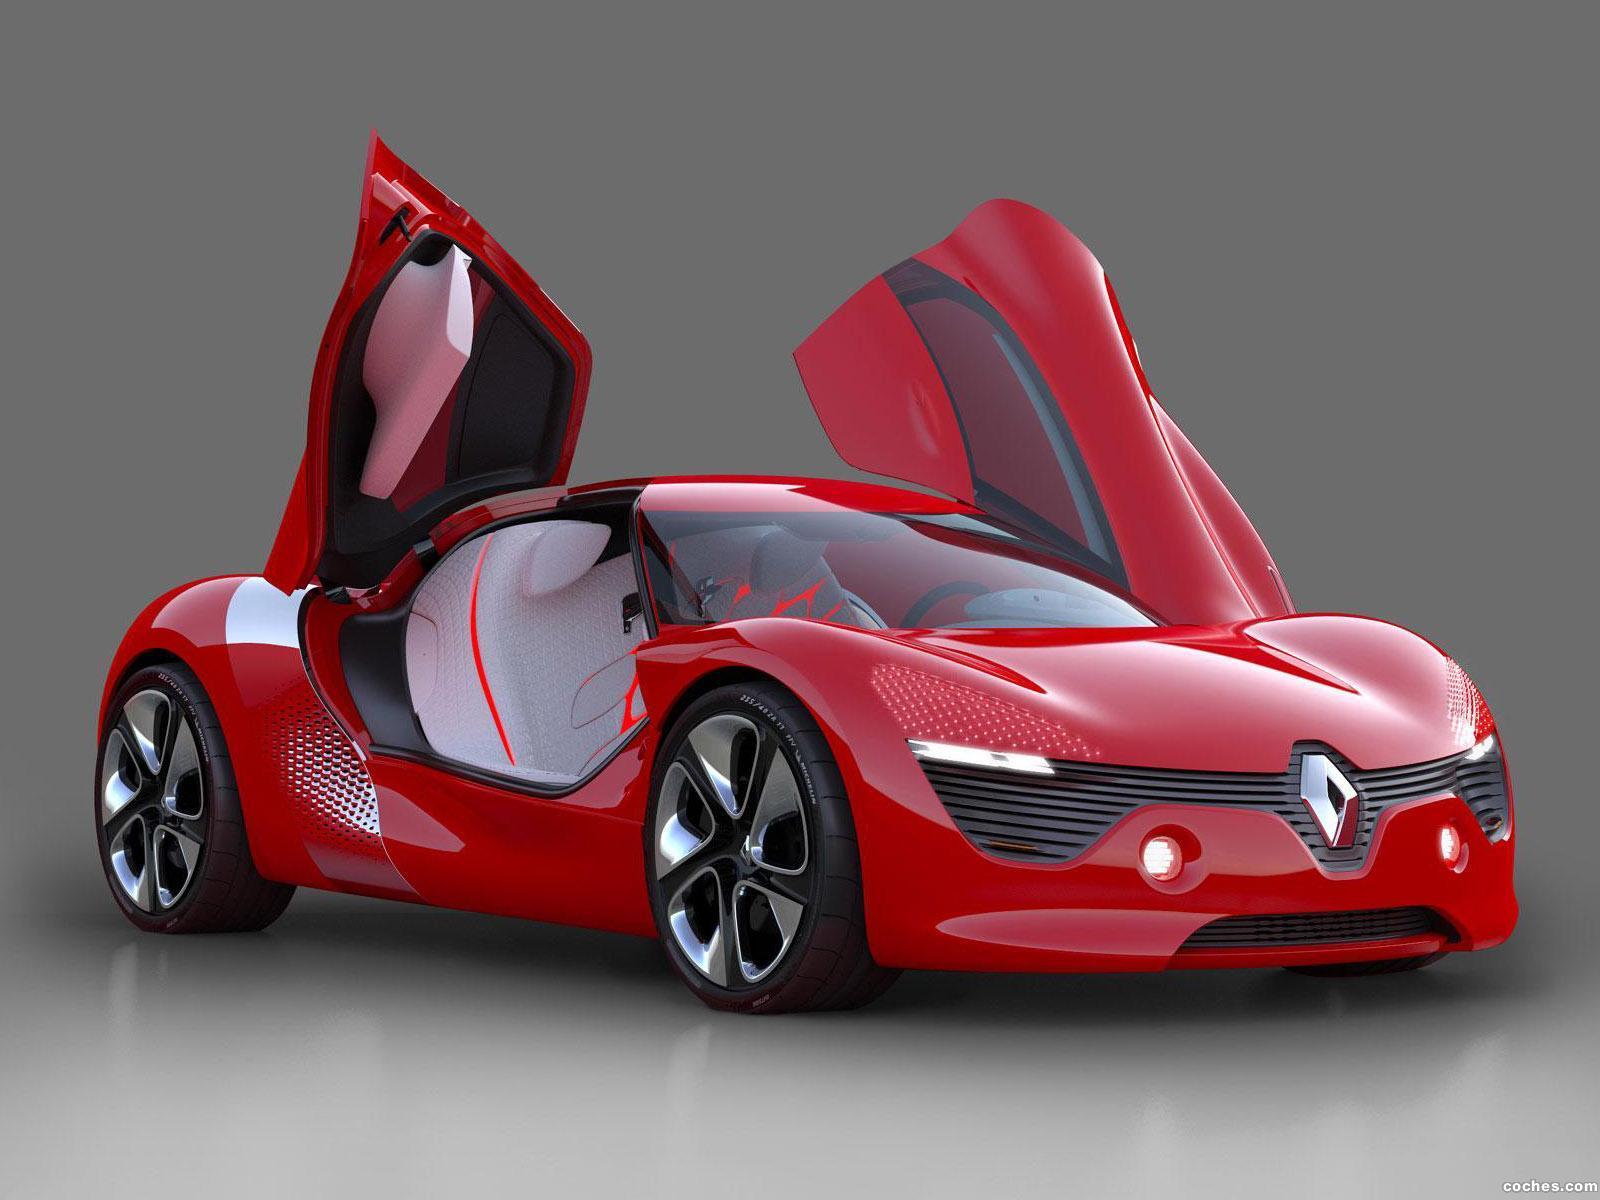 Foto 2 de Renault DeZir Concept 2010